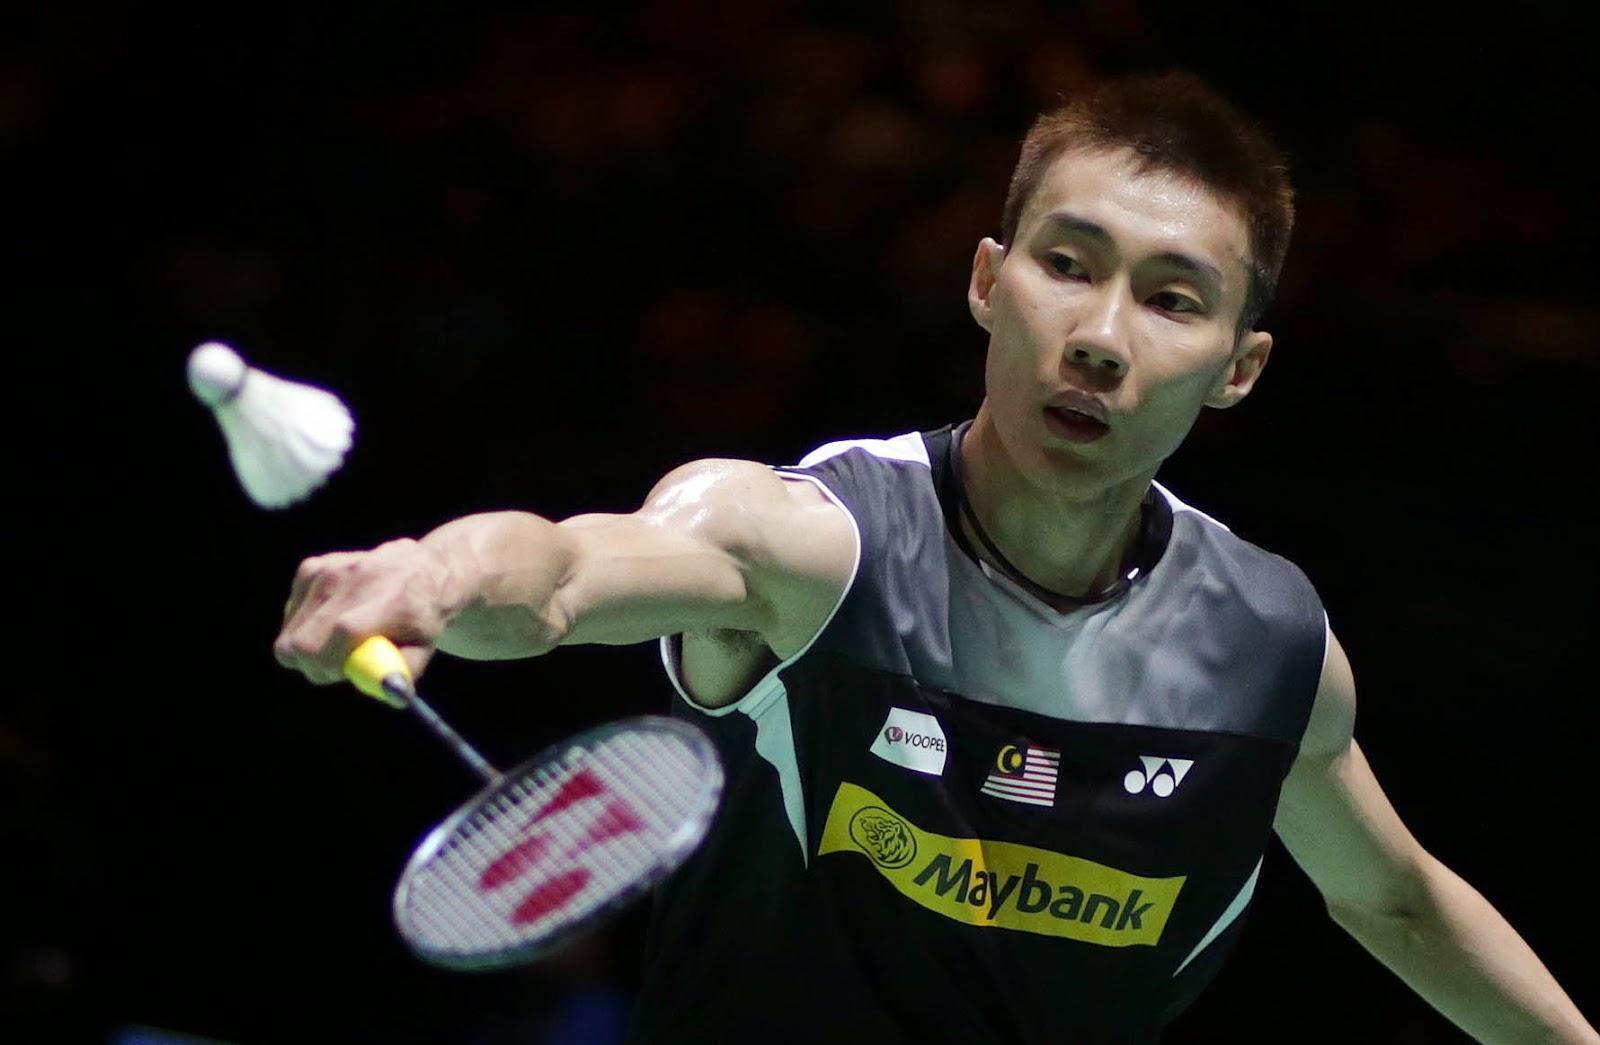 Sunway Badminton World